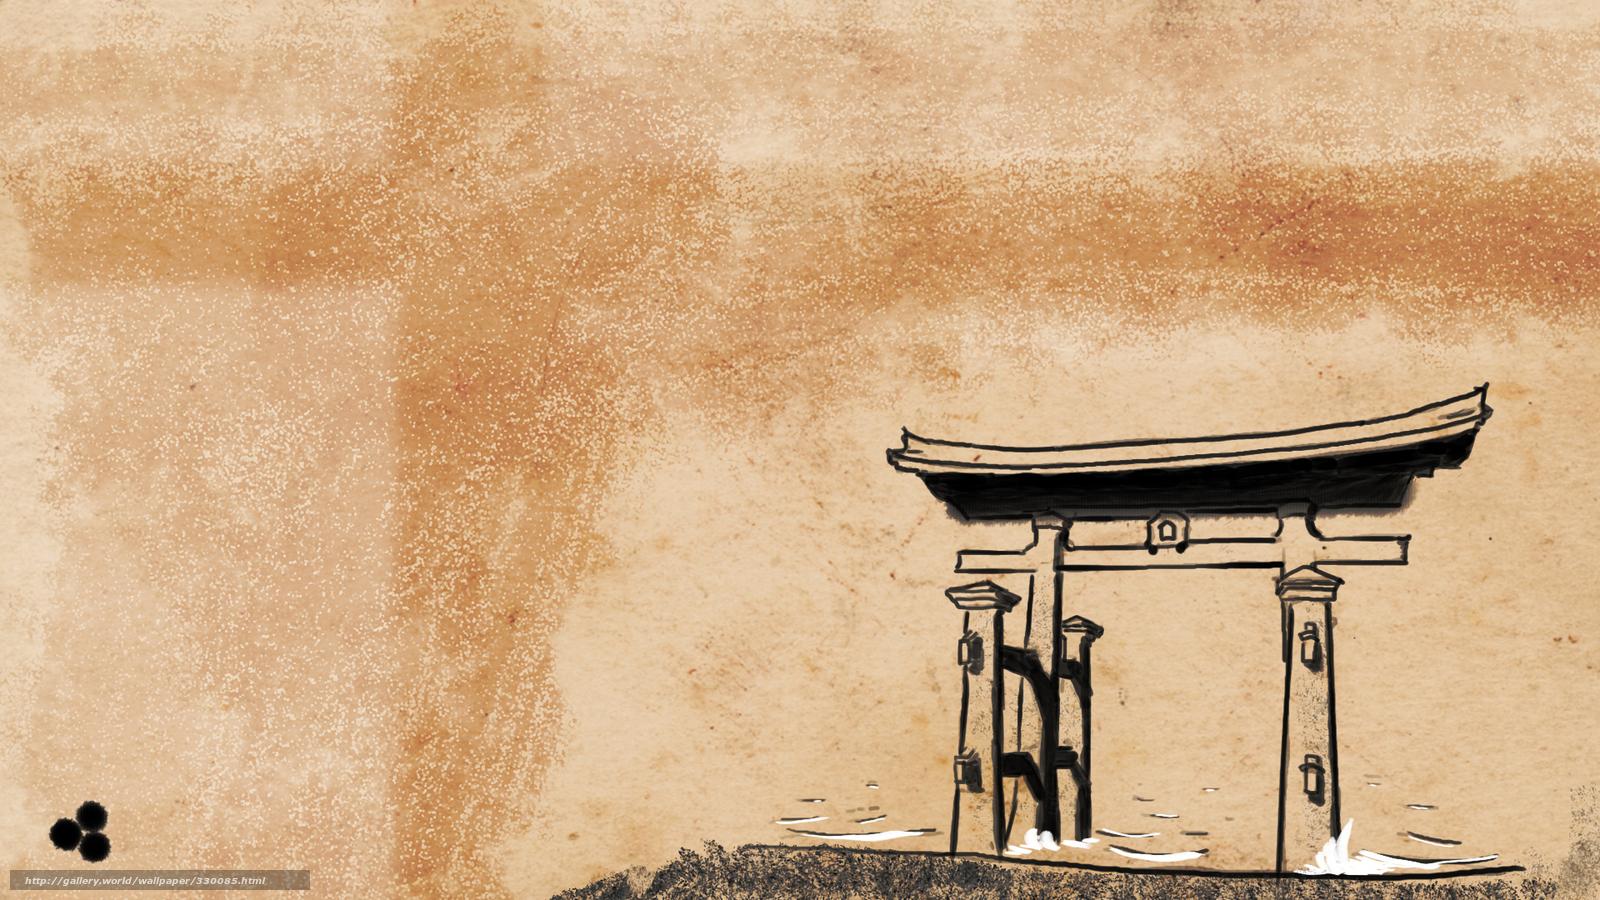 Download wallpaper trajectory Shintoism Japan Japanese style 1600x900